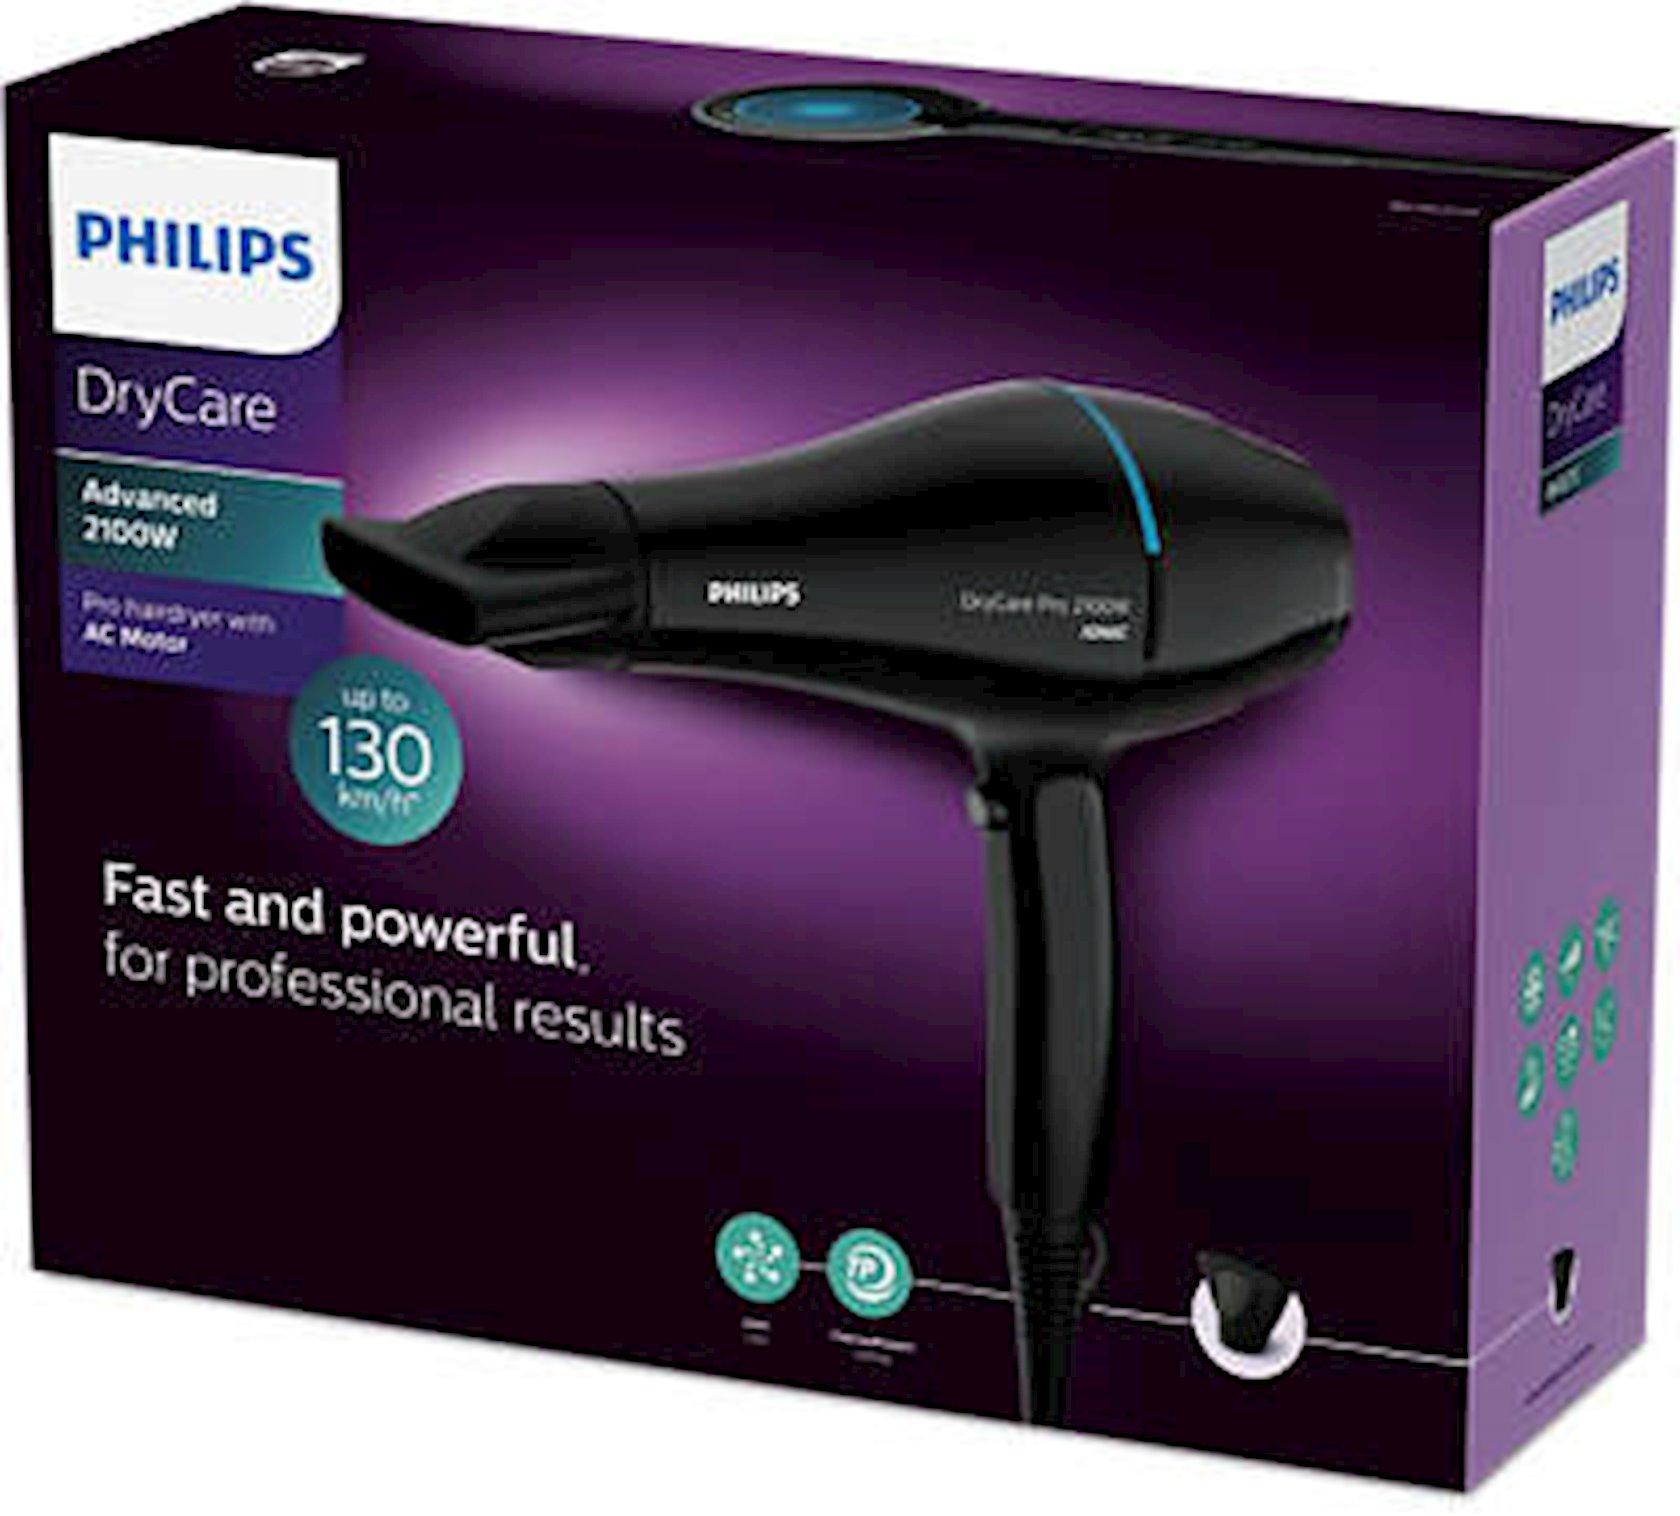 Fen Philips BHD272 DryCare